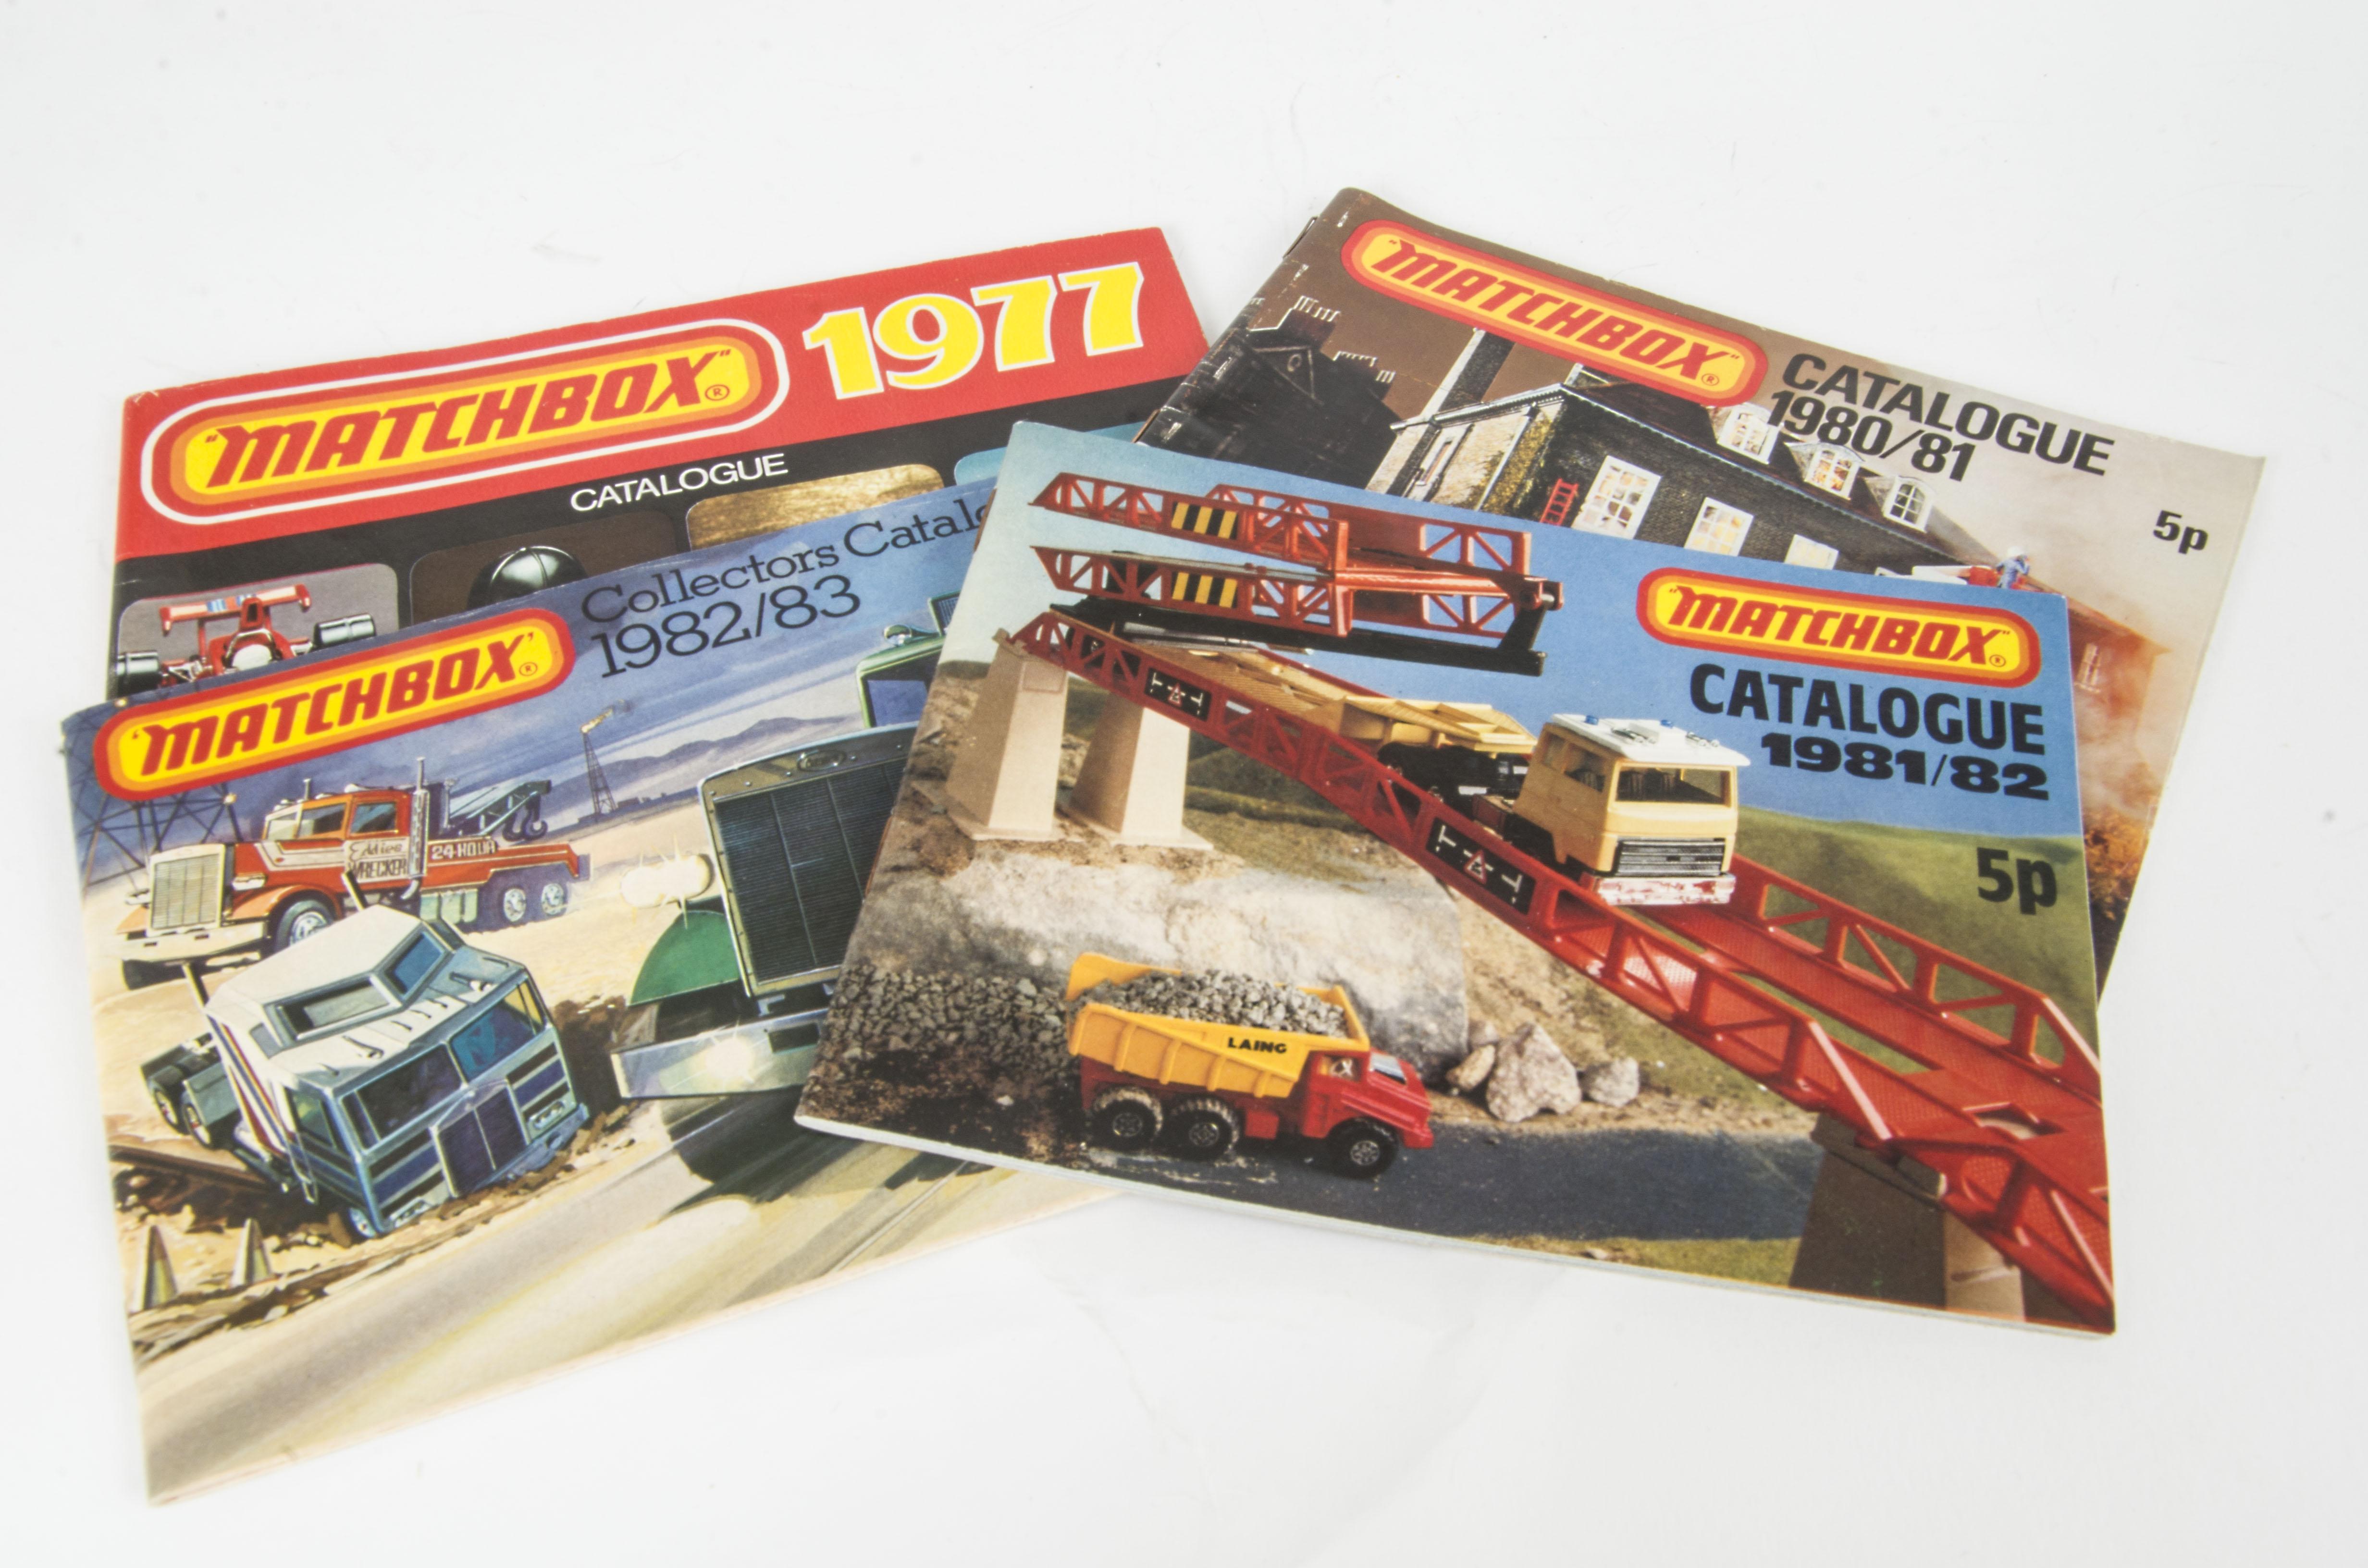 Matchbox Catalogues, 1970, 1972, 1973, 1975(2), 1976 (2), 1977, 1978